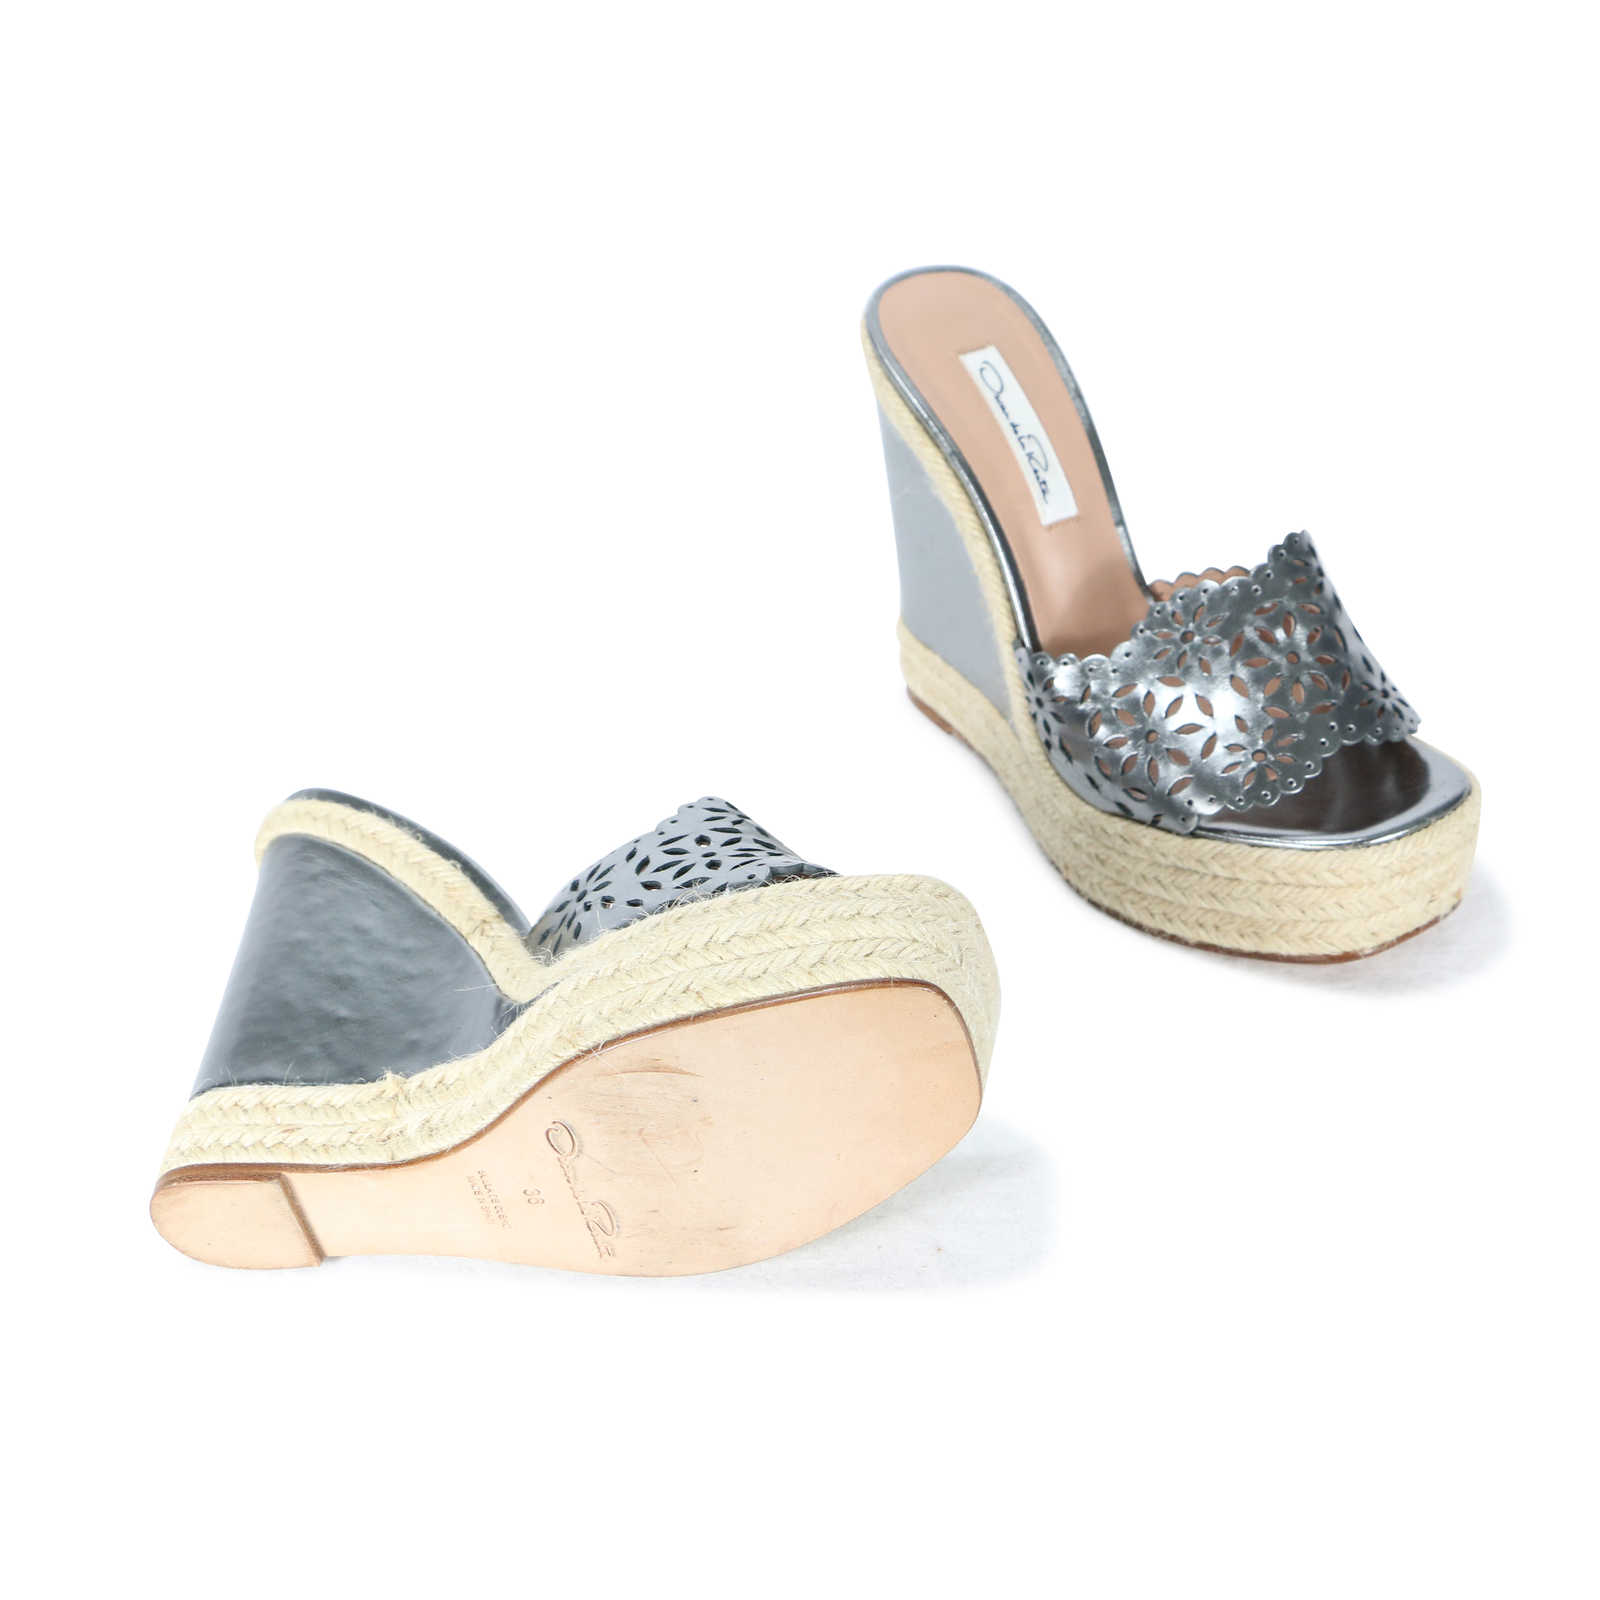 75b30666d4c6 oscar-de-la-renta-laser-cut-wedge-high-espadrille-sandals-3.jpg